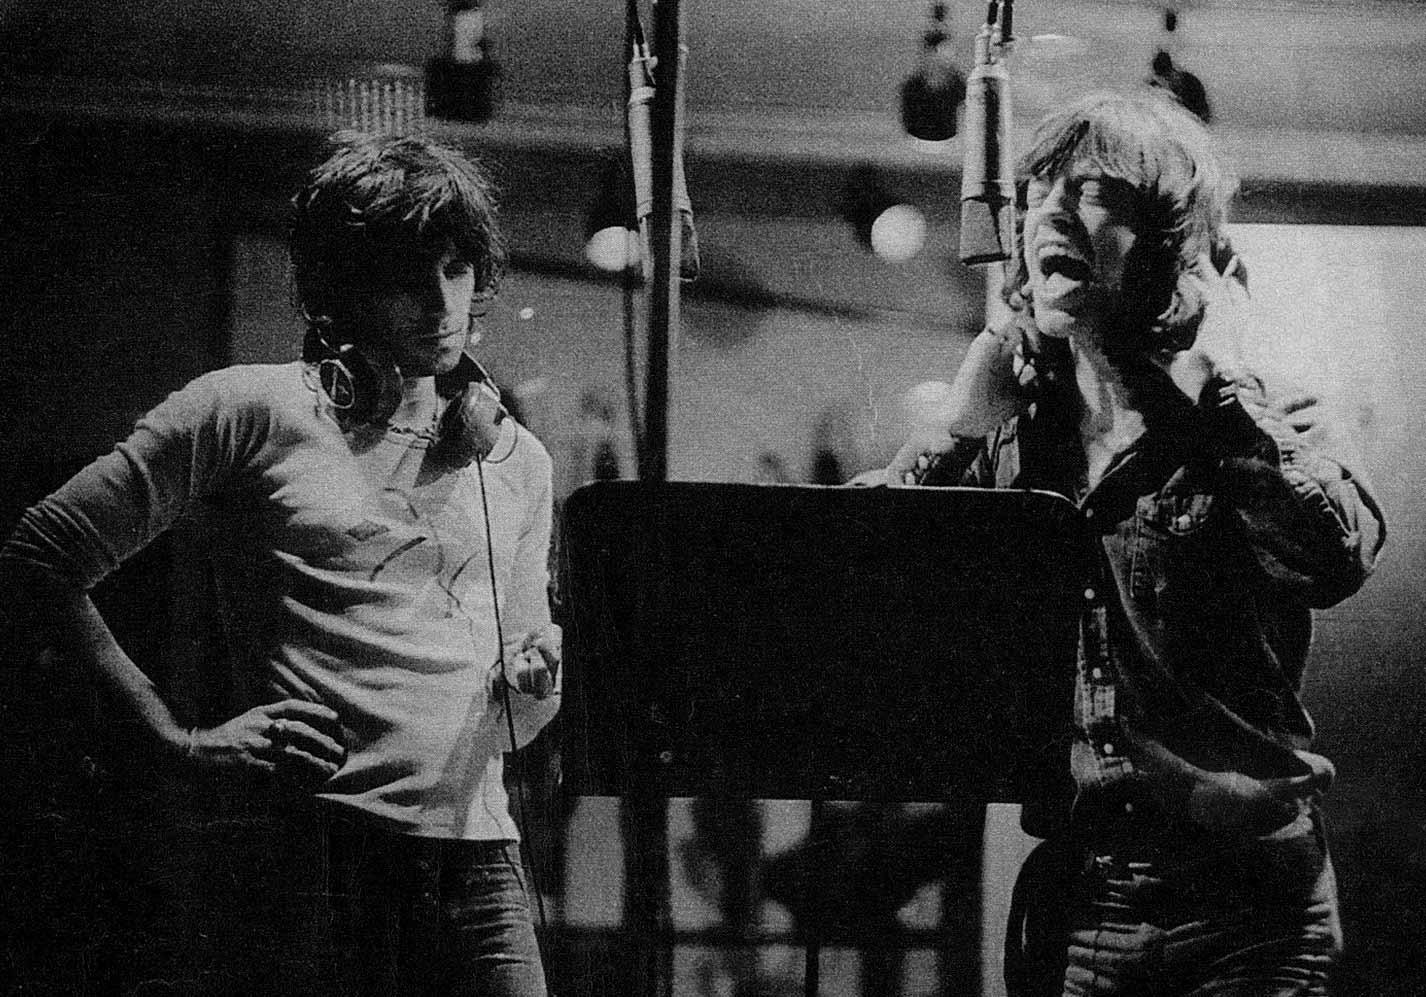 sunset_artists_Rolling-Stones